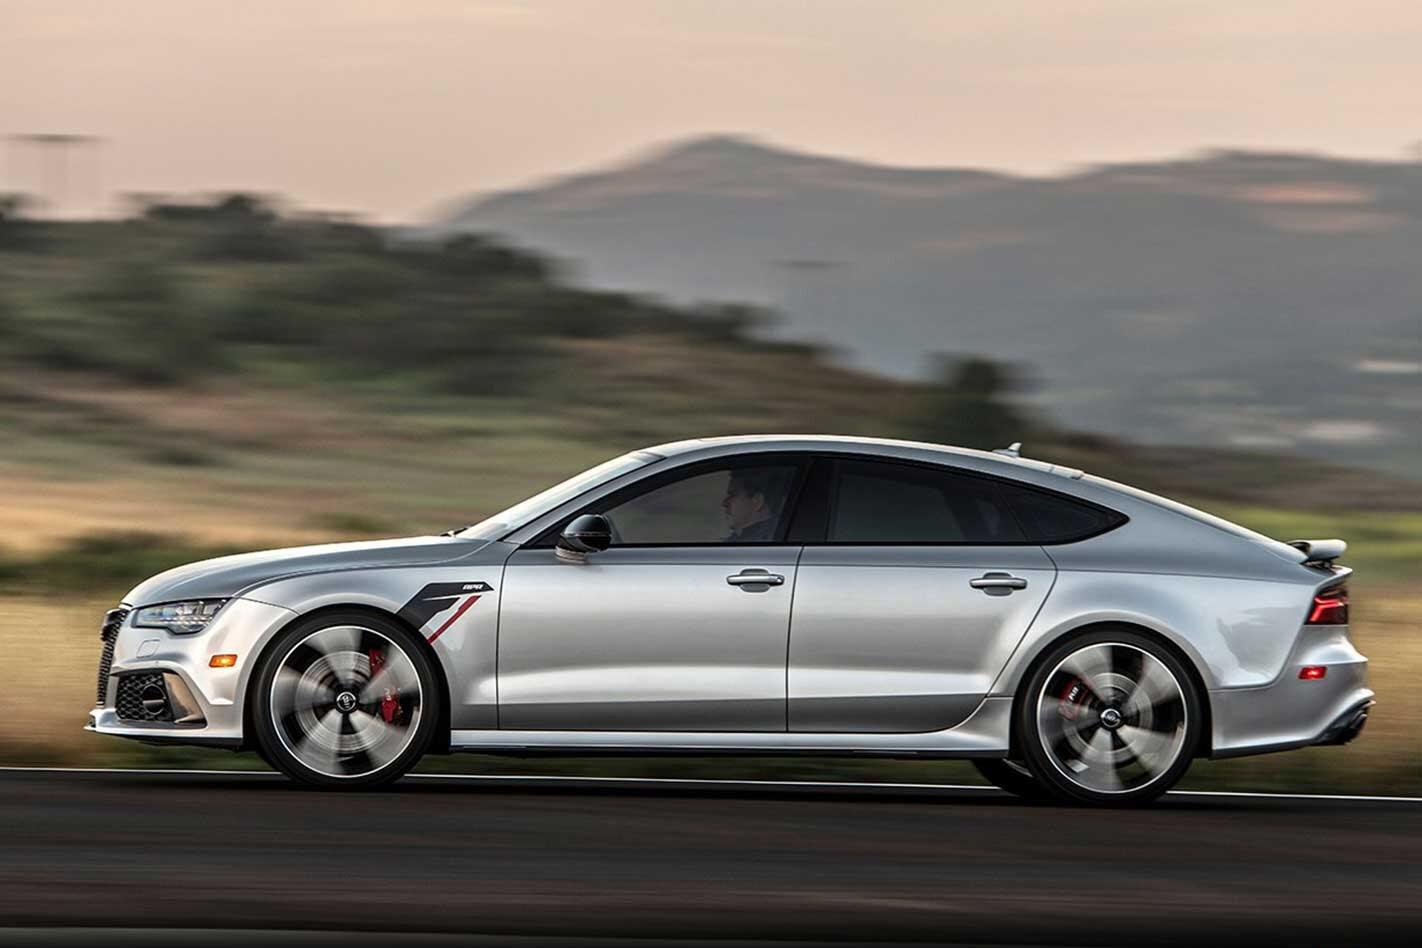 AddArmor APR armoured Audi RS7 revealed